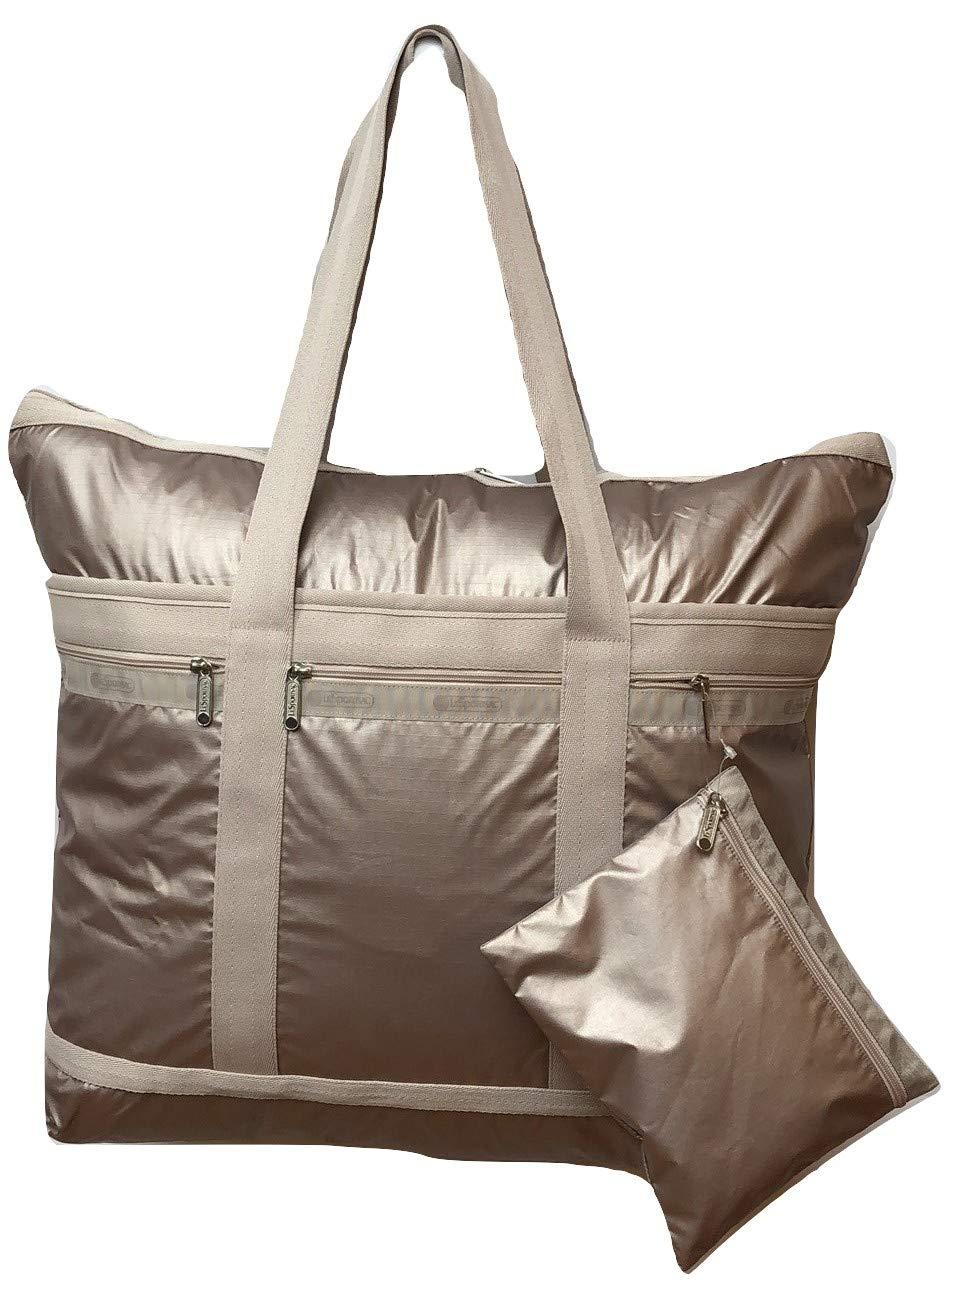 LeSportsac Moon Blush Lightning Travel Tote + Matching Cosmetic Bag (pearl iridescent rose gold)